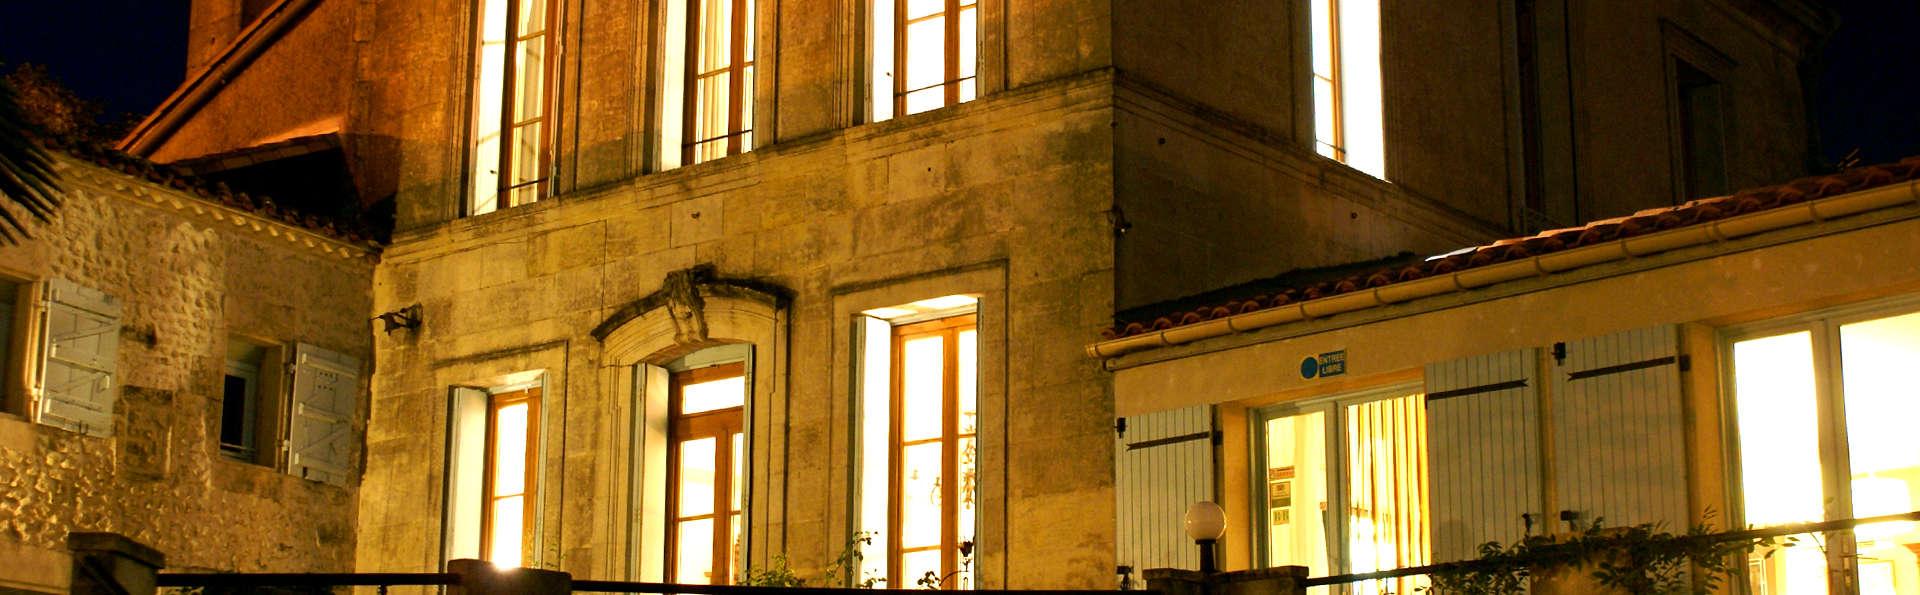 Domaine La Fontaine - EDIT_Exterior.jpg